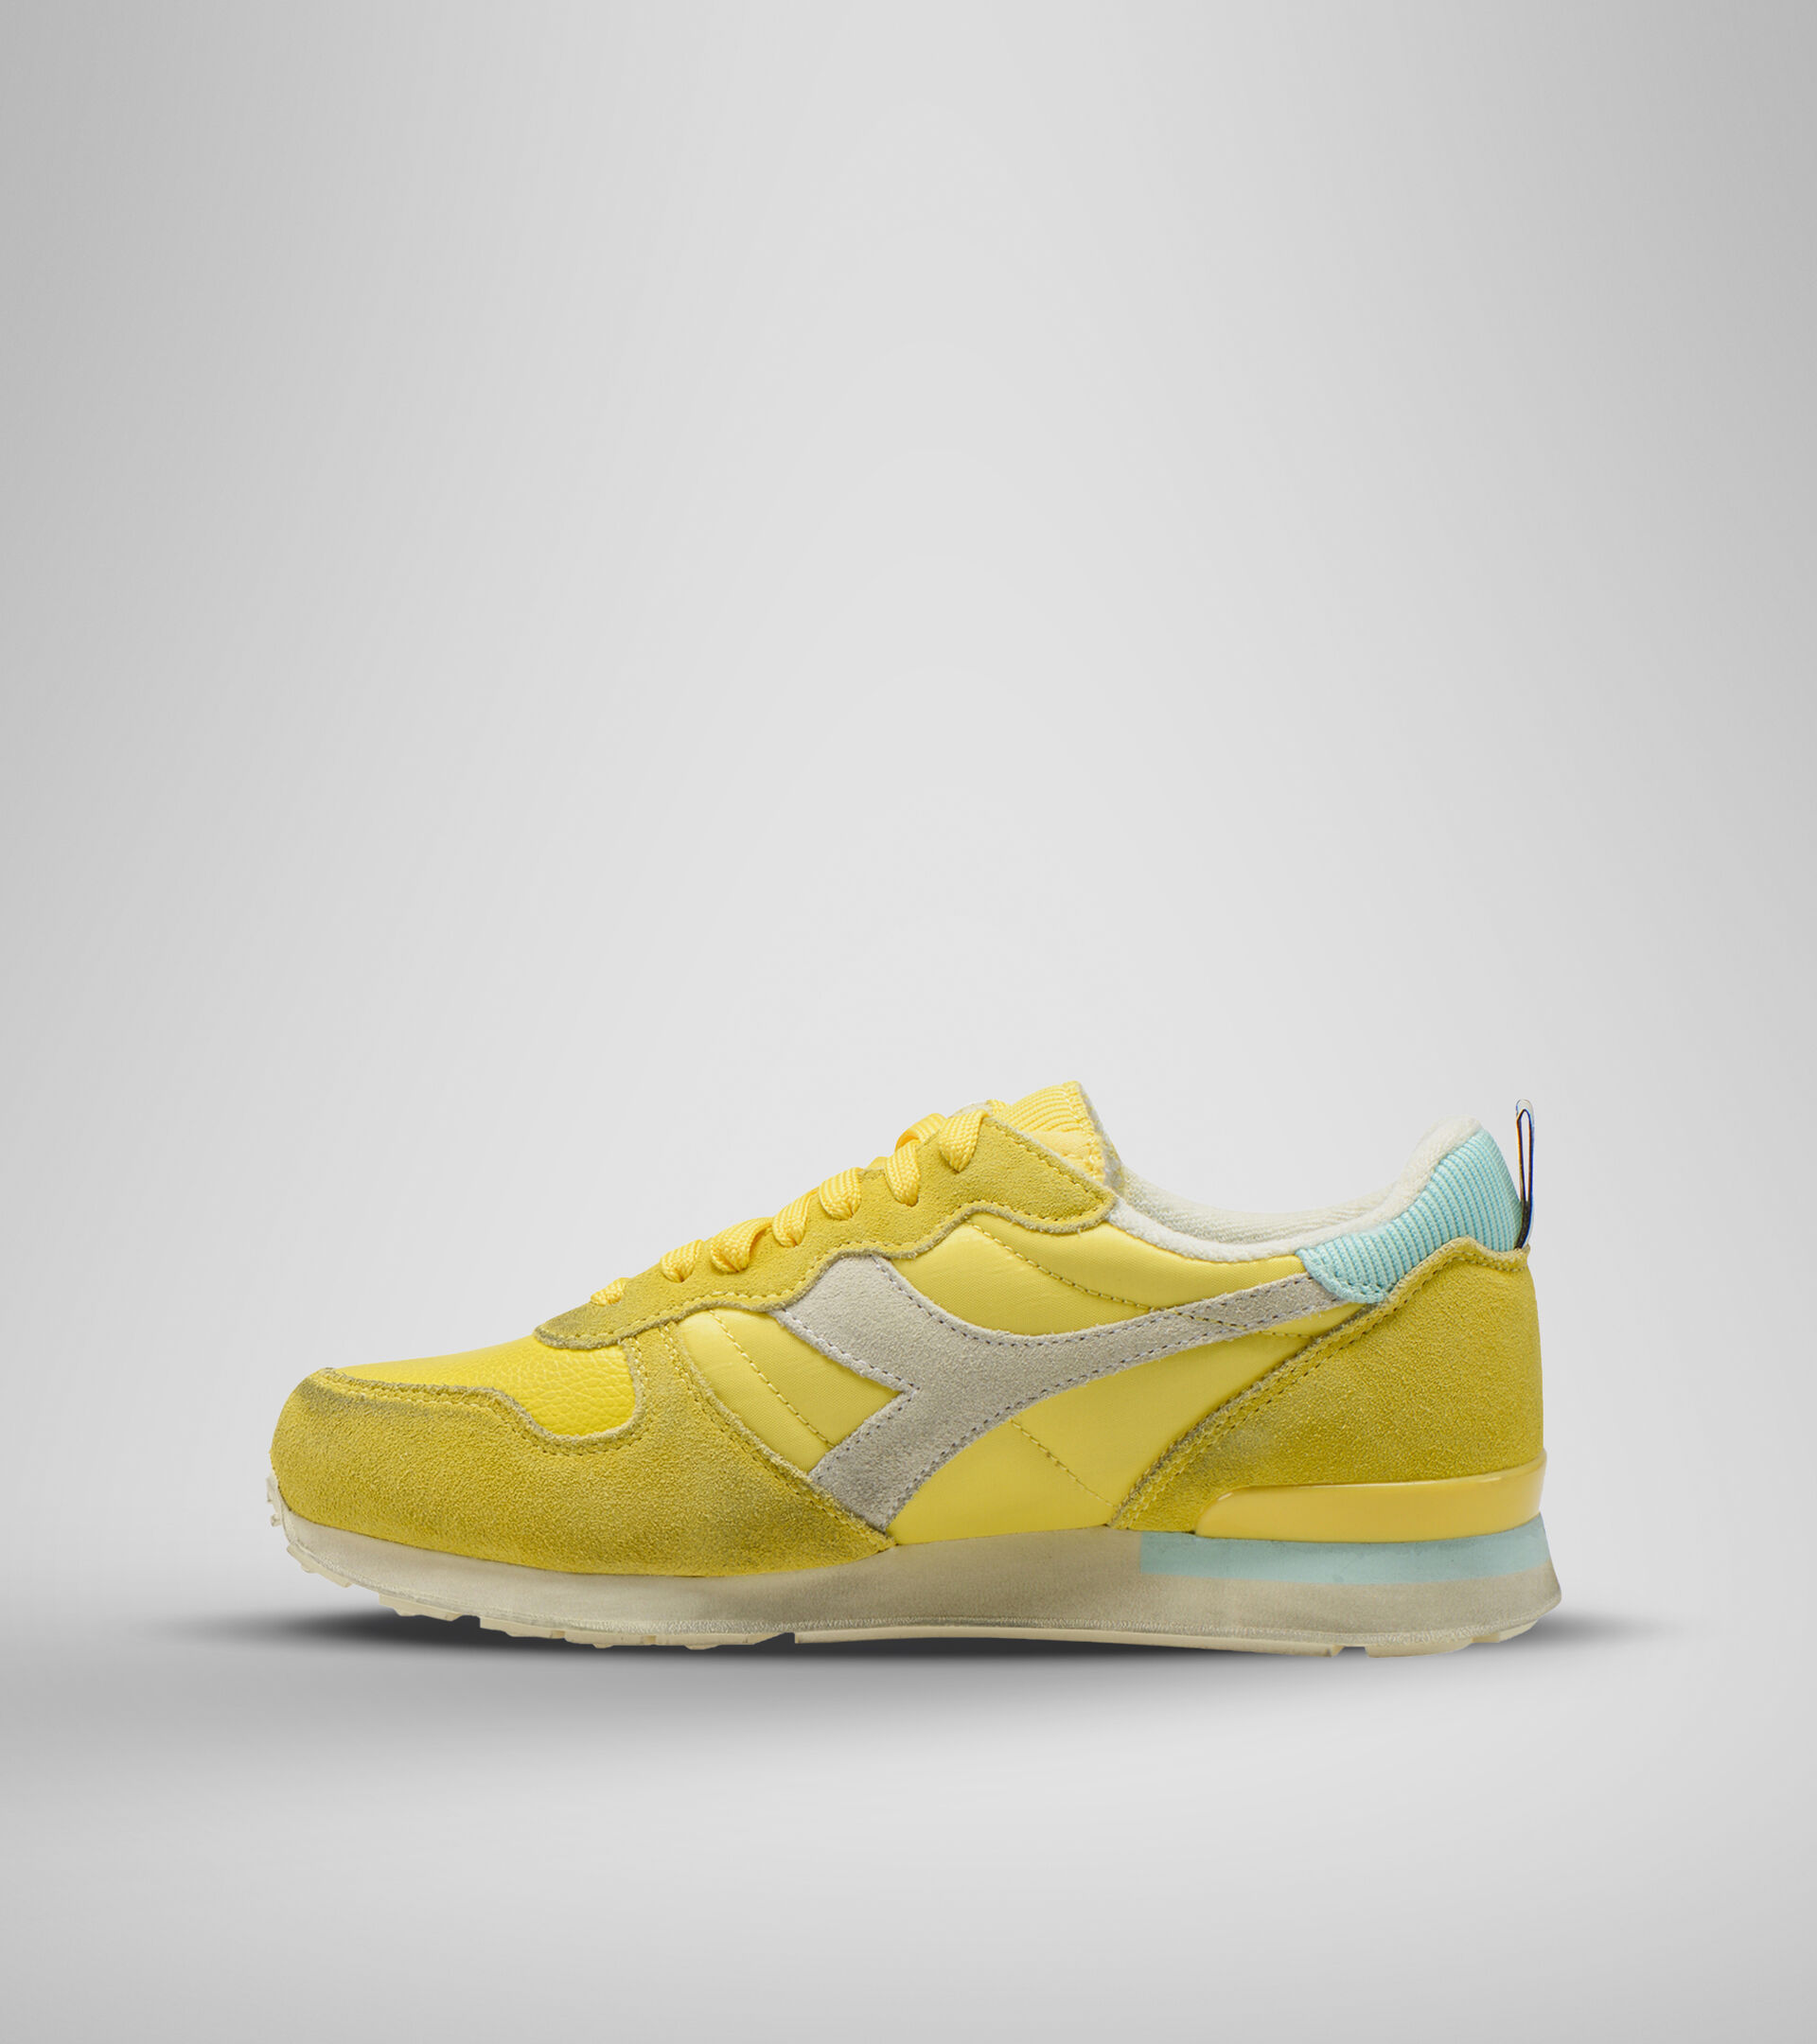 Footwear Sportswear DONNA CAMARO ICONA WN GIALLO CARDELLINO/AZZURRO TINT Diadora